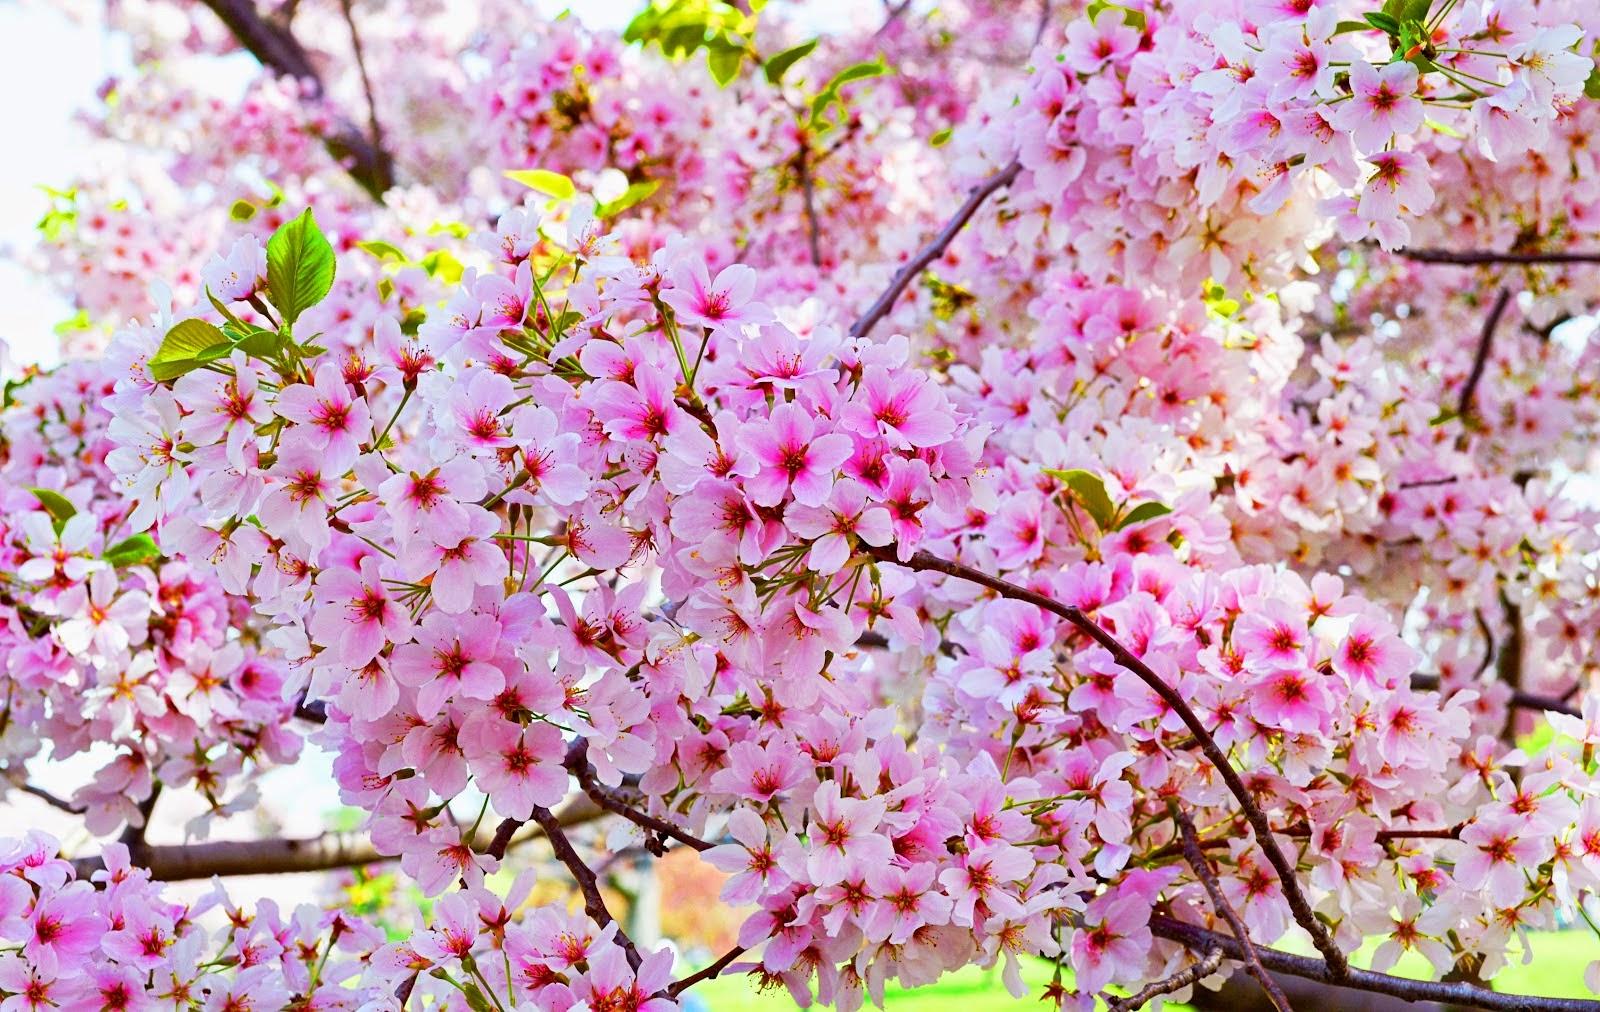 hewan lucu 2016 animasi bergerak bunga sakura berguguran